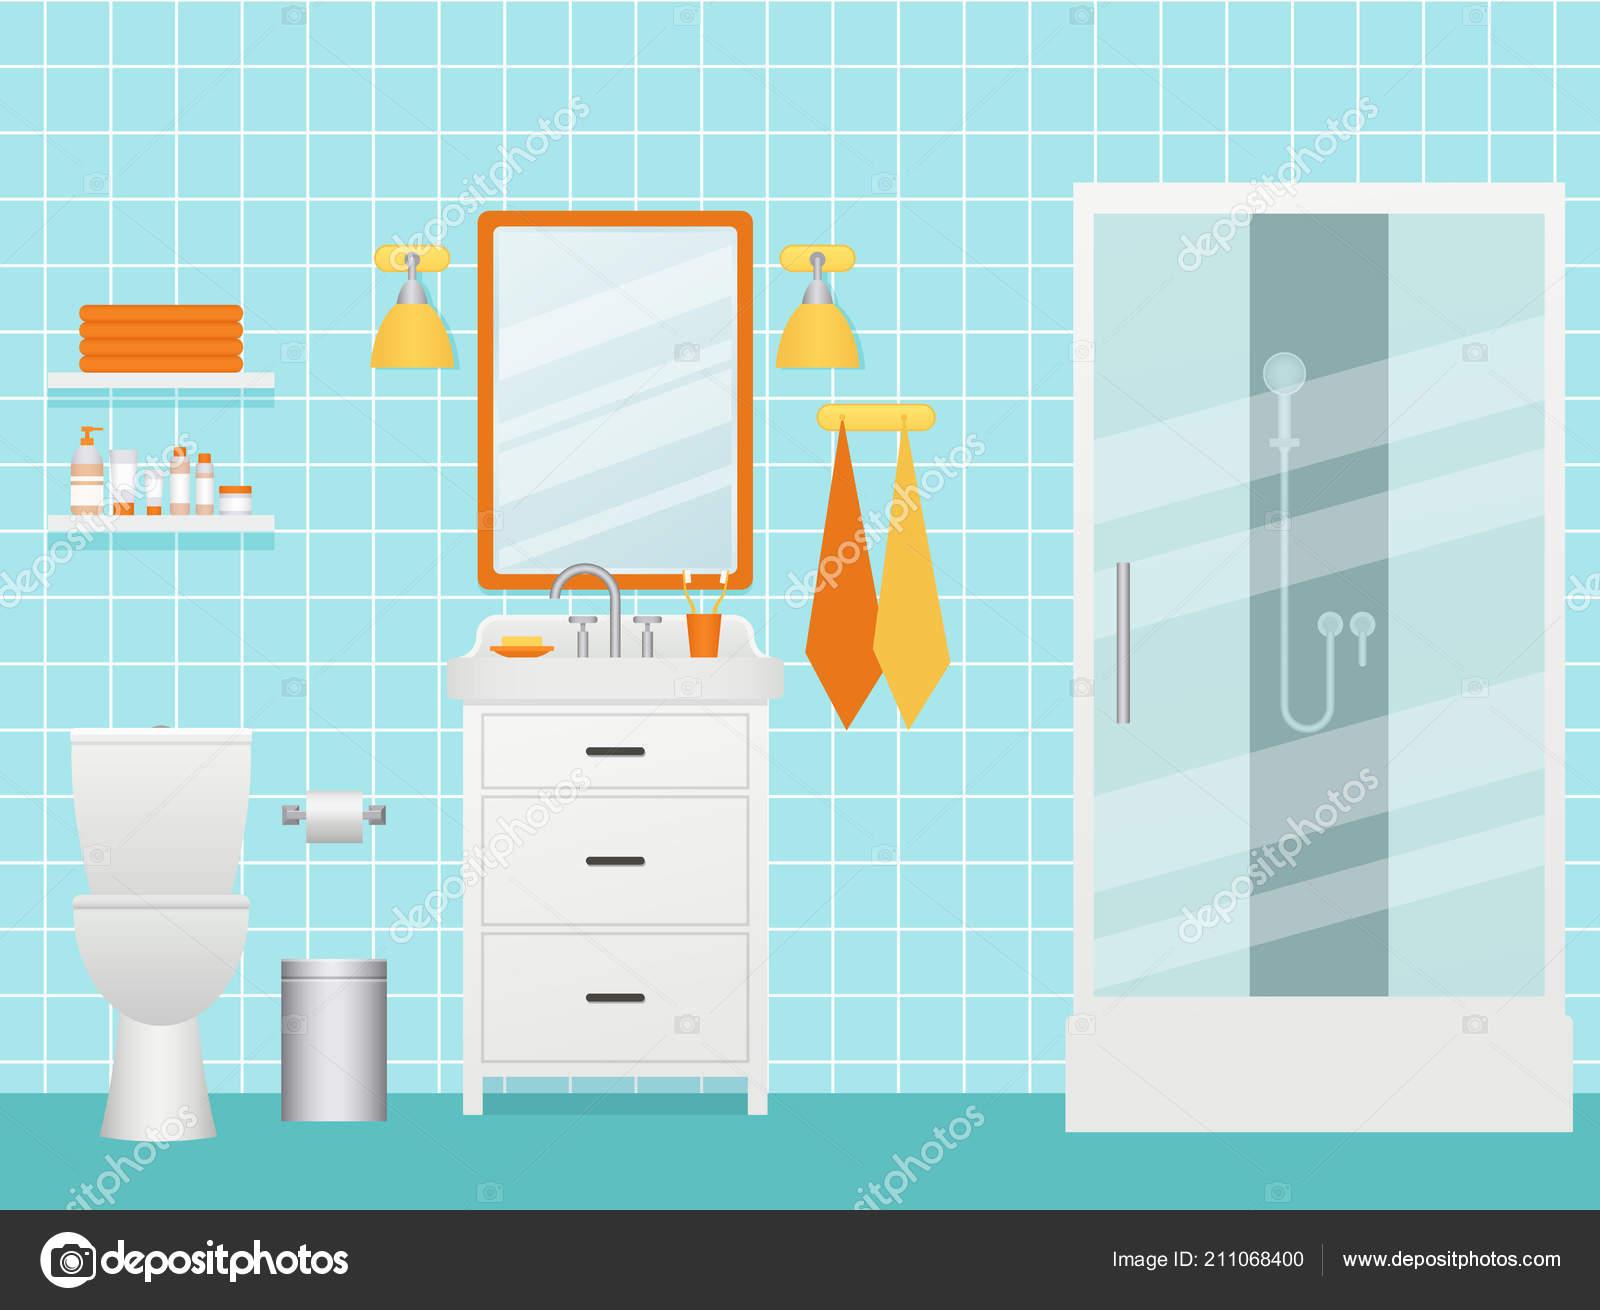 Bathroom Interior Vector Cartoon Room Shower Cabin Sink Shelves